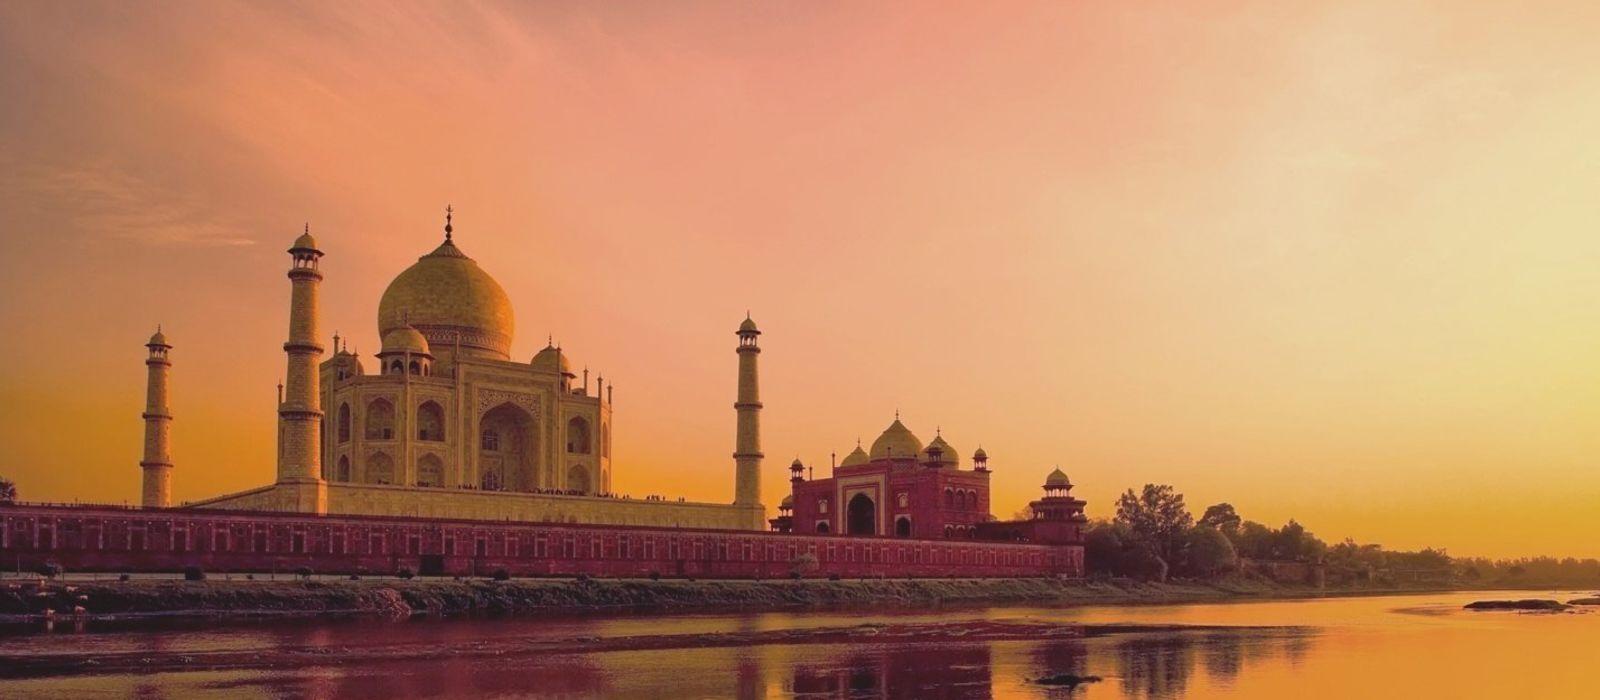 Taj Mahal Agra during sunset, India